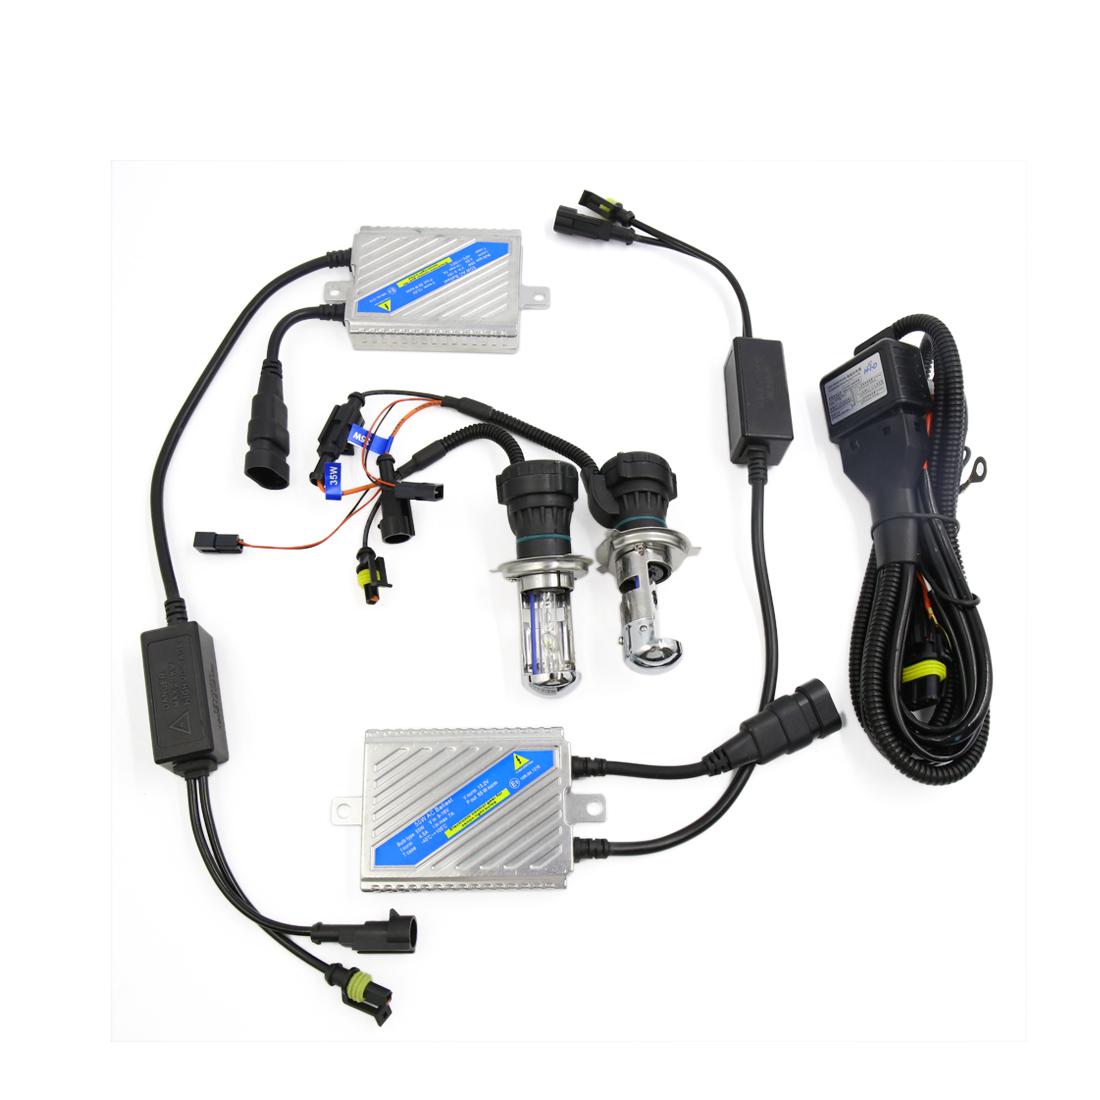 2PCS H4 12V 55W 8000K Hi/Lo Beam HID Headlight Conversion Lamp Bulb Kit for Car